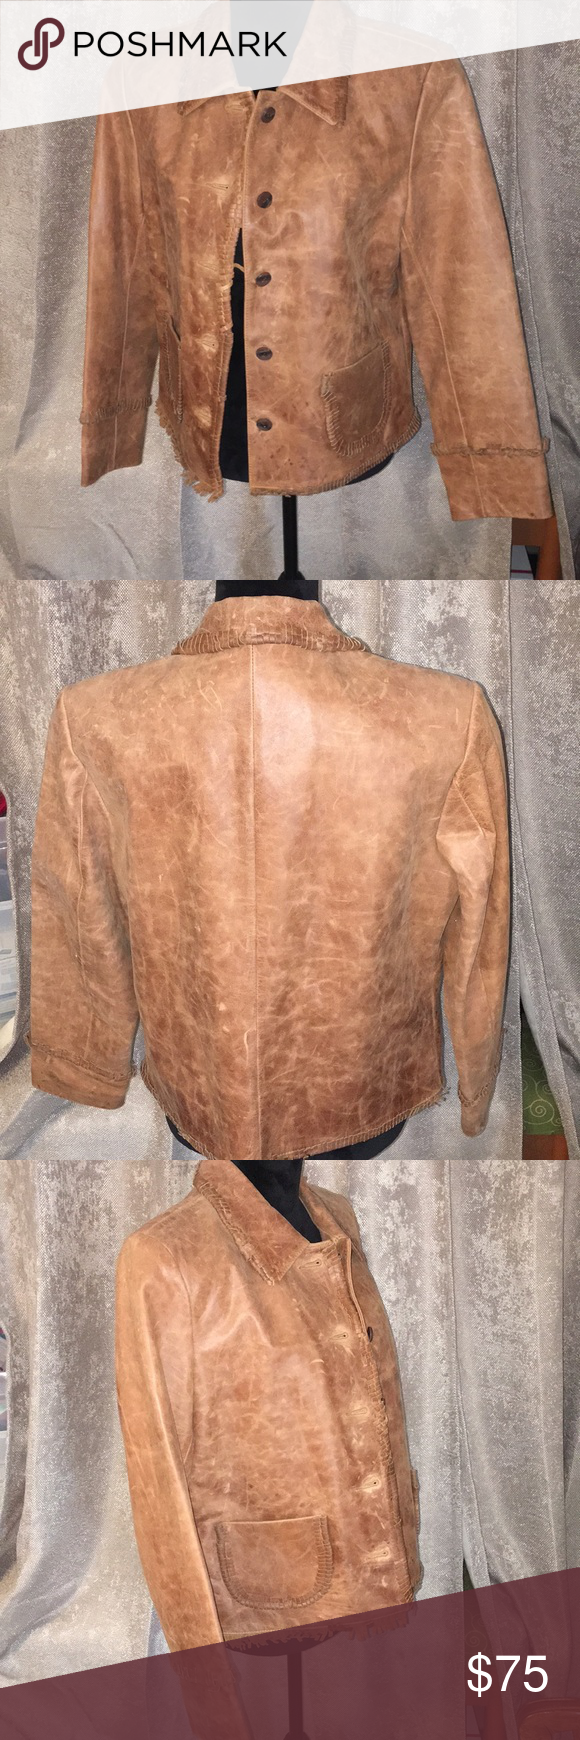 Vintage Wrangler Distressed Leather Jacket Vintage Wrangler Distressed Leather Jacket Distressed Leather [ 1740 x 580 Pixel ]